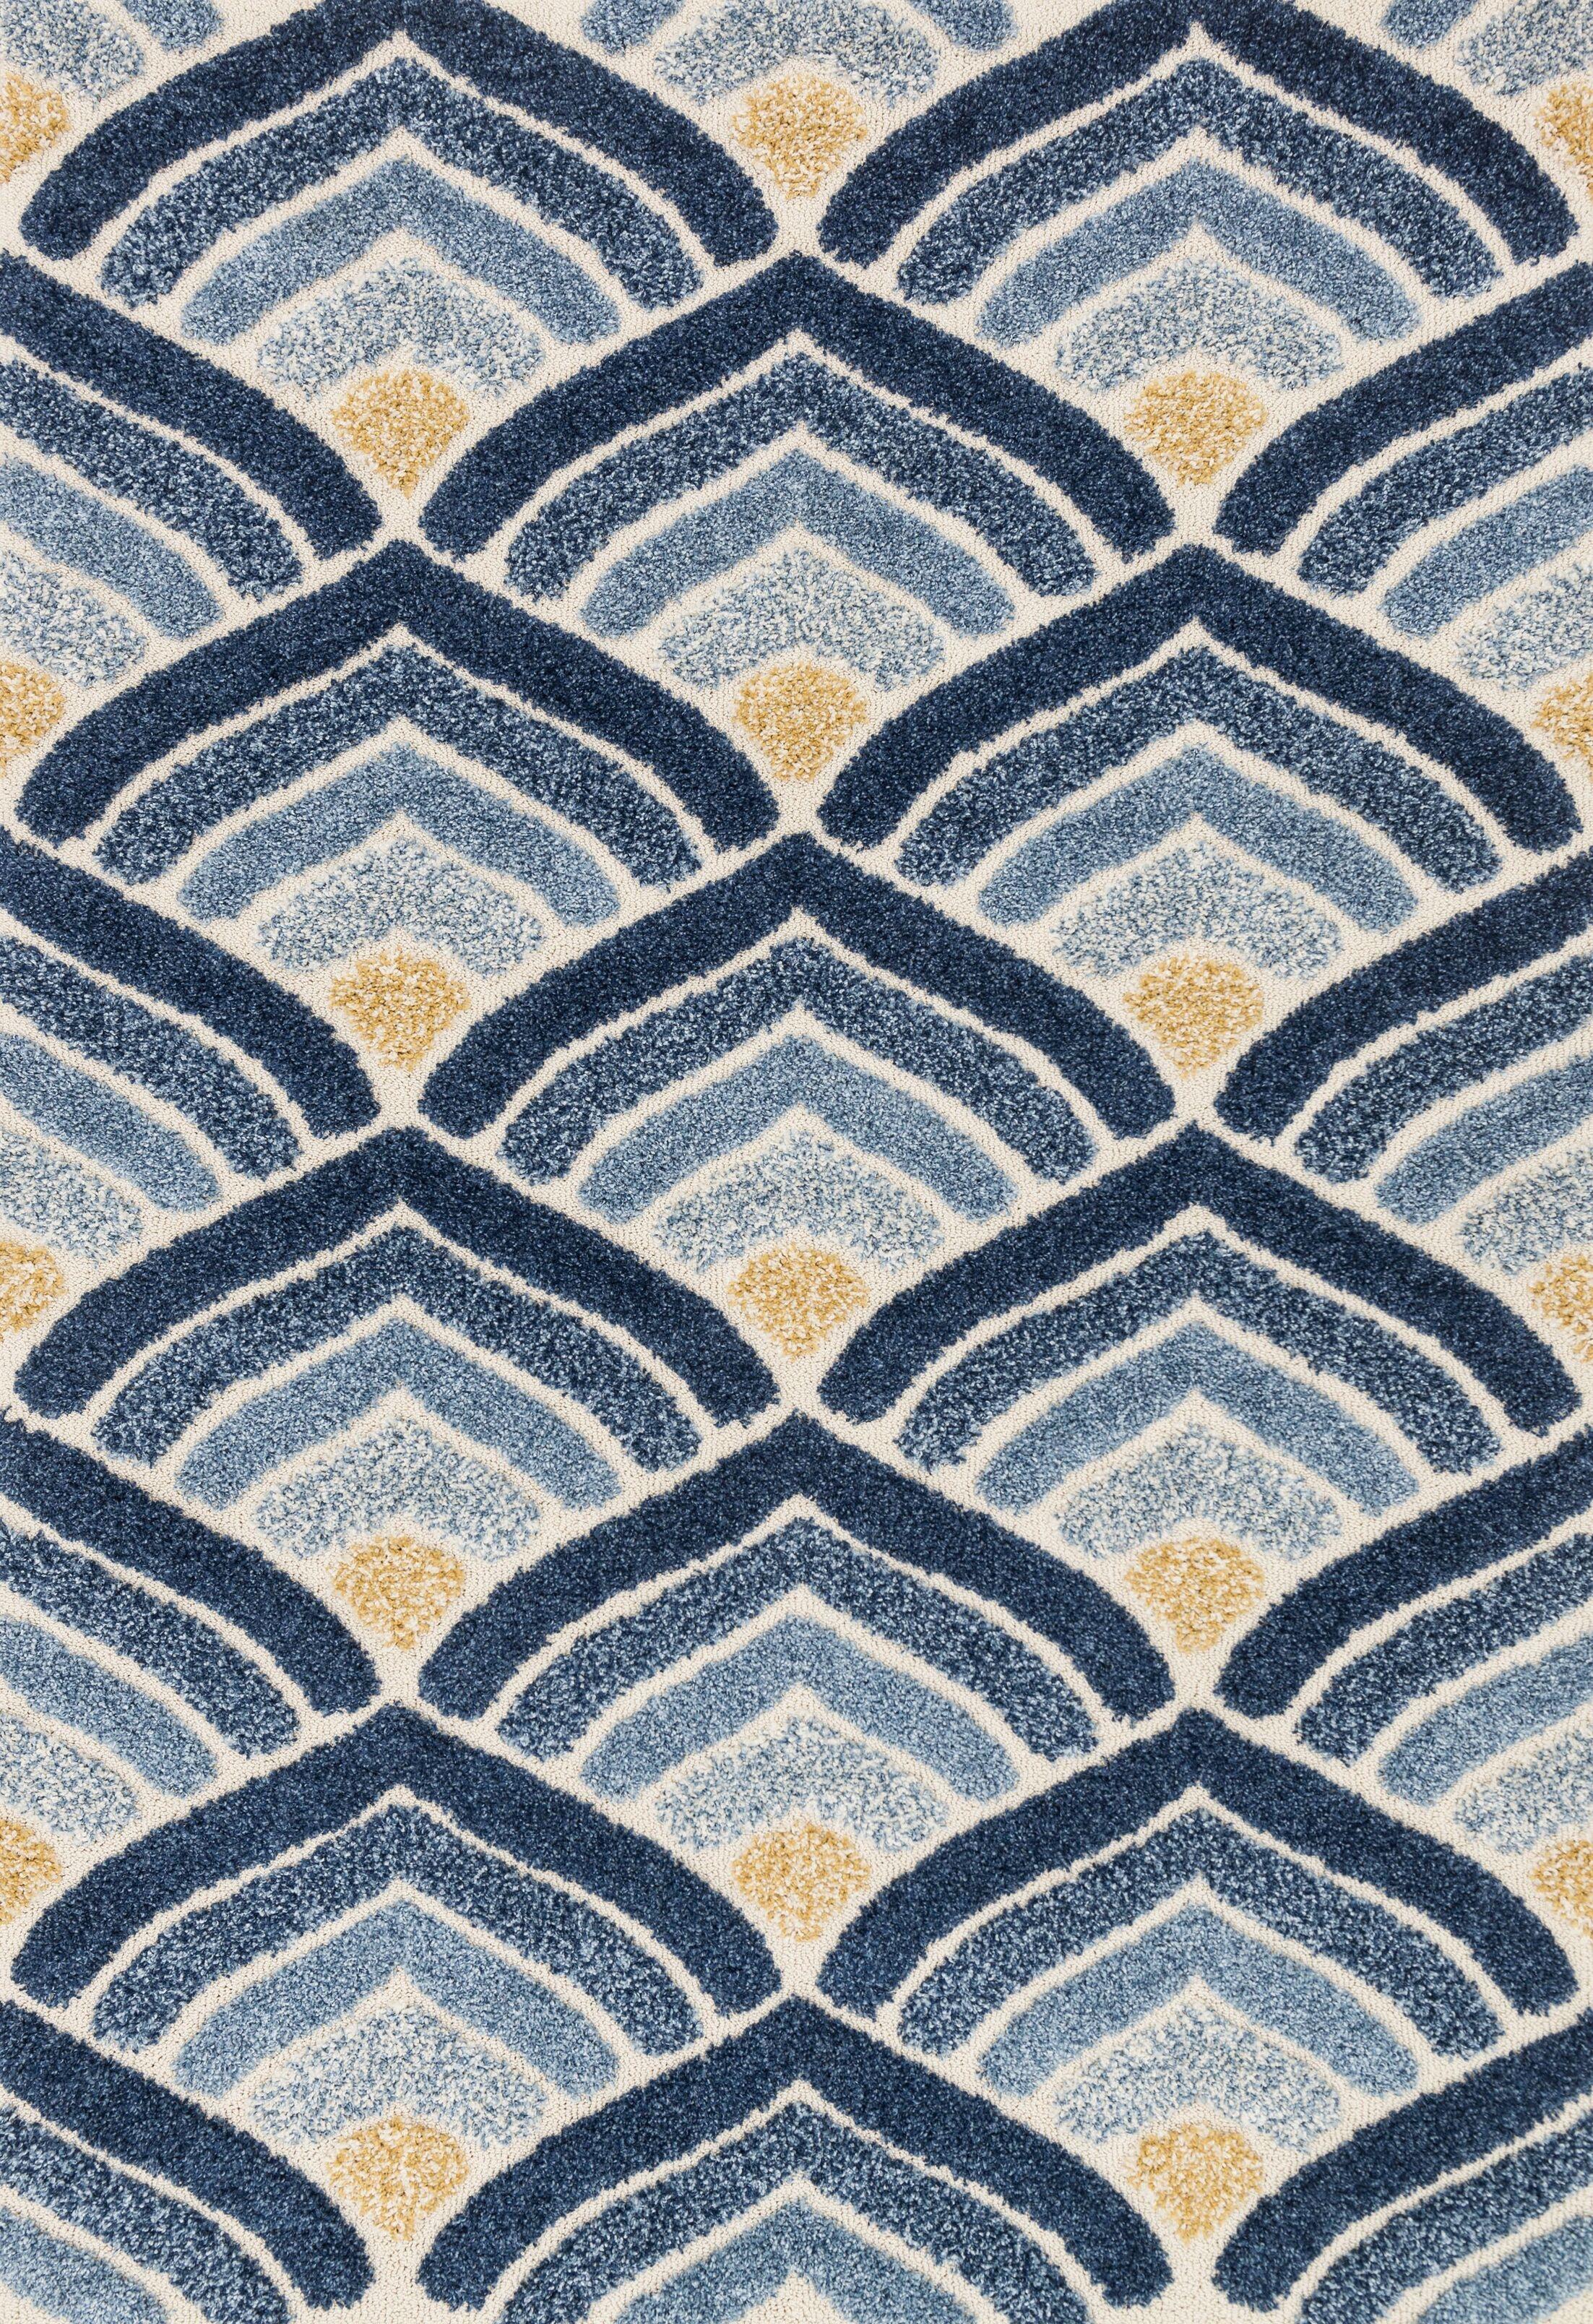 Dania Blue/Ivory Area Rug Rug Size: Rectangle 3'10